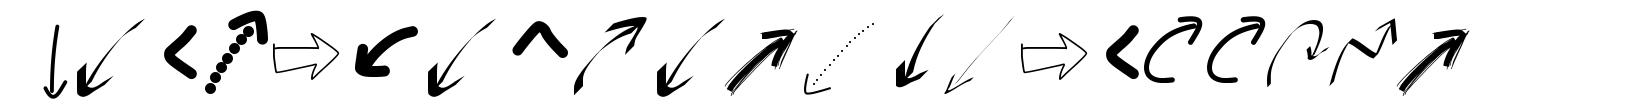 Peax Webdesign arrows font